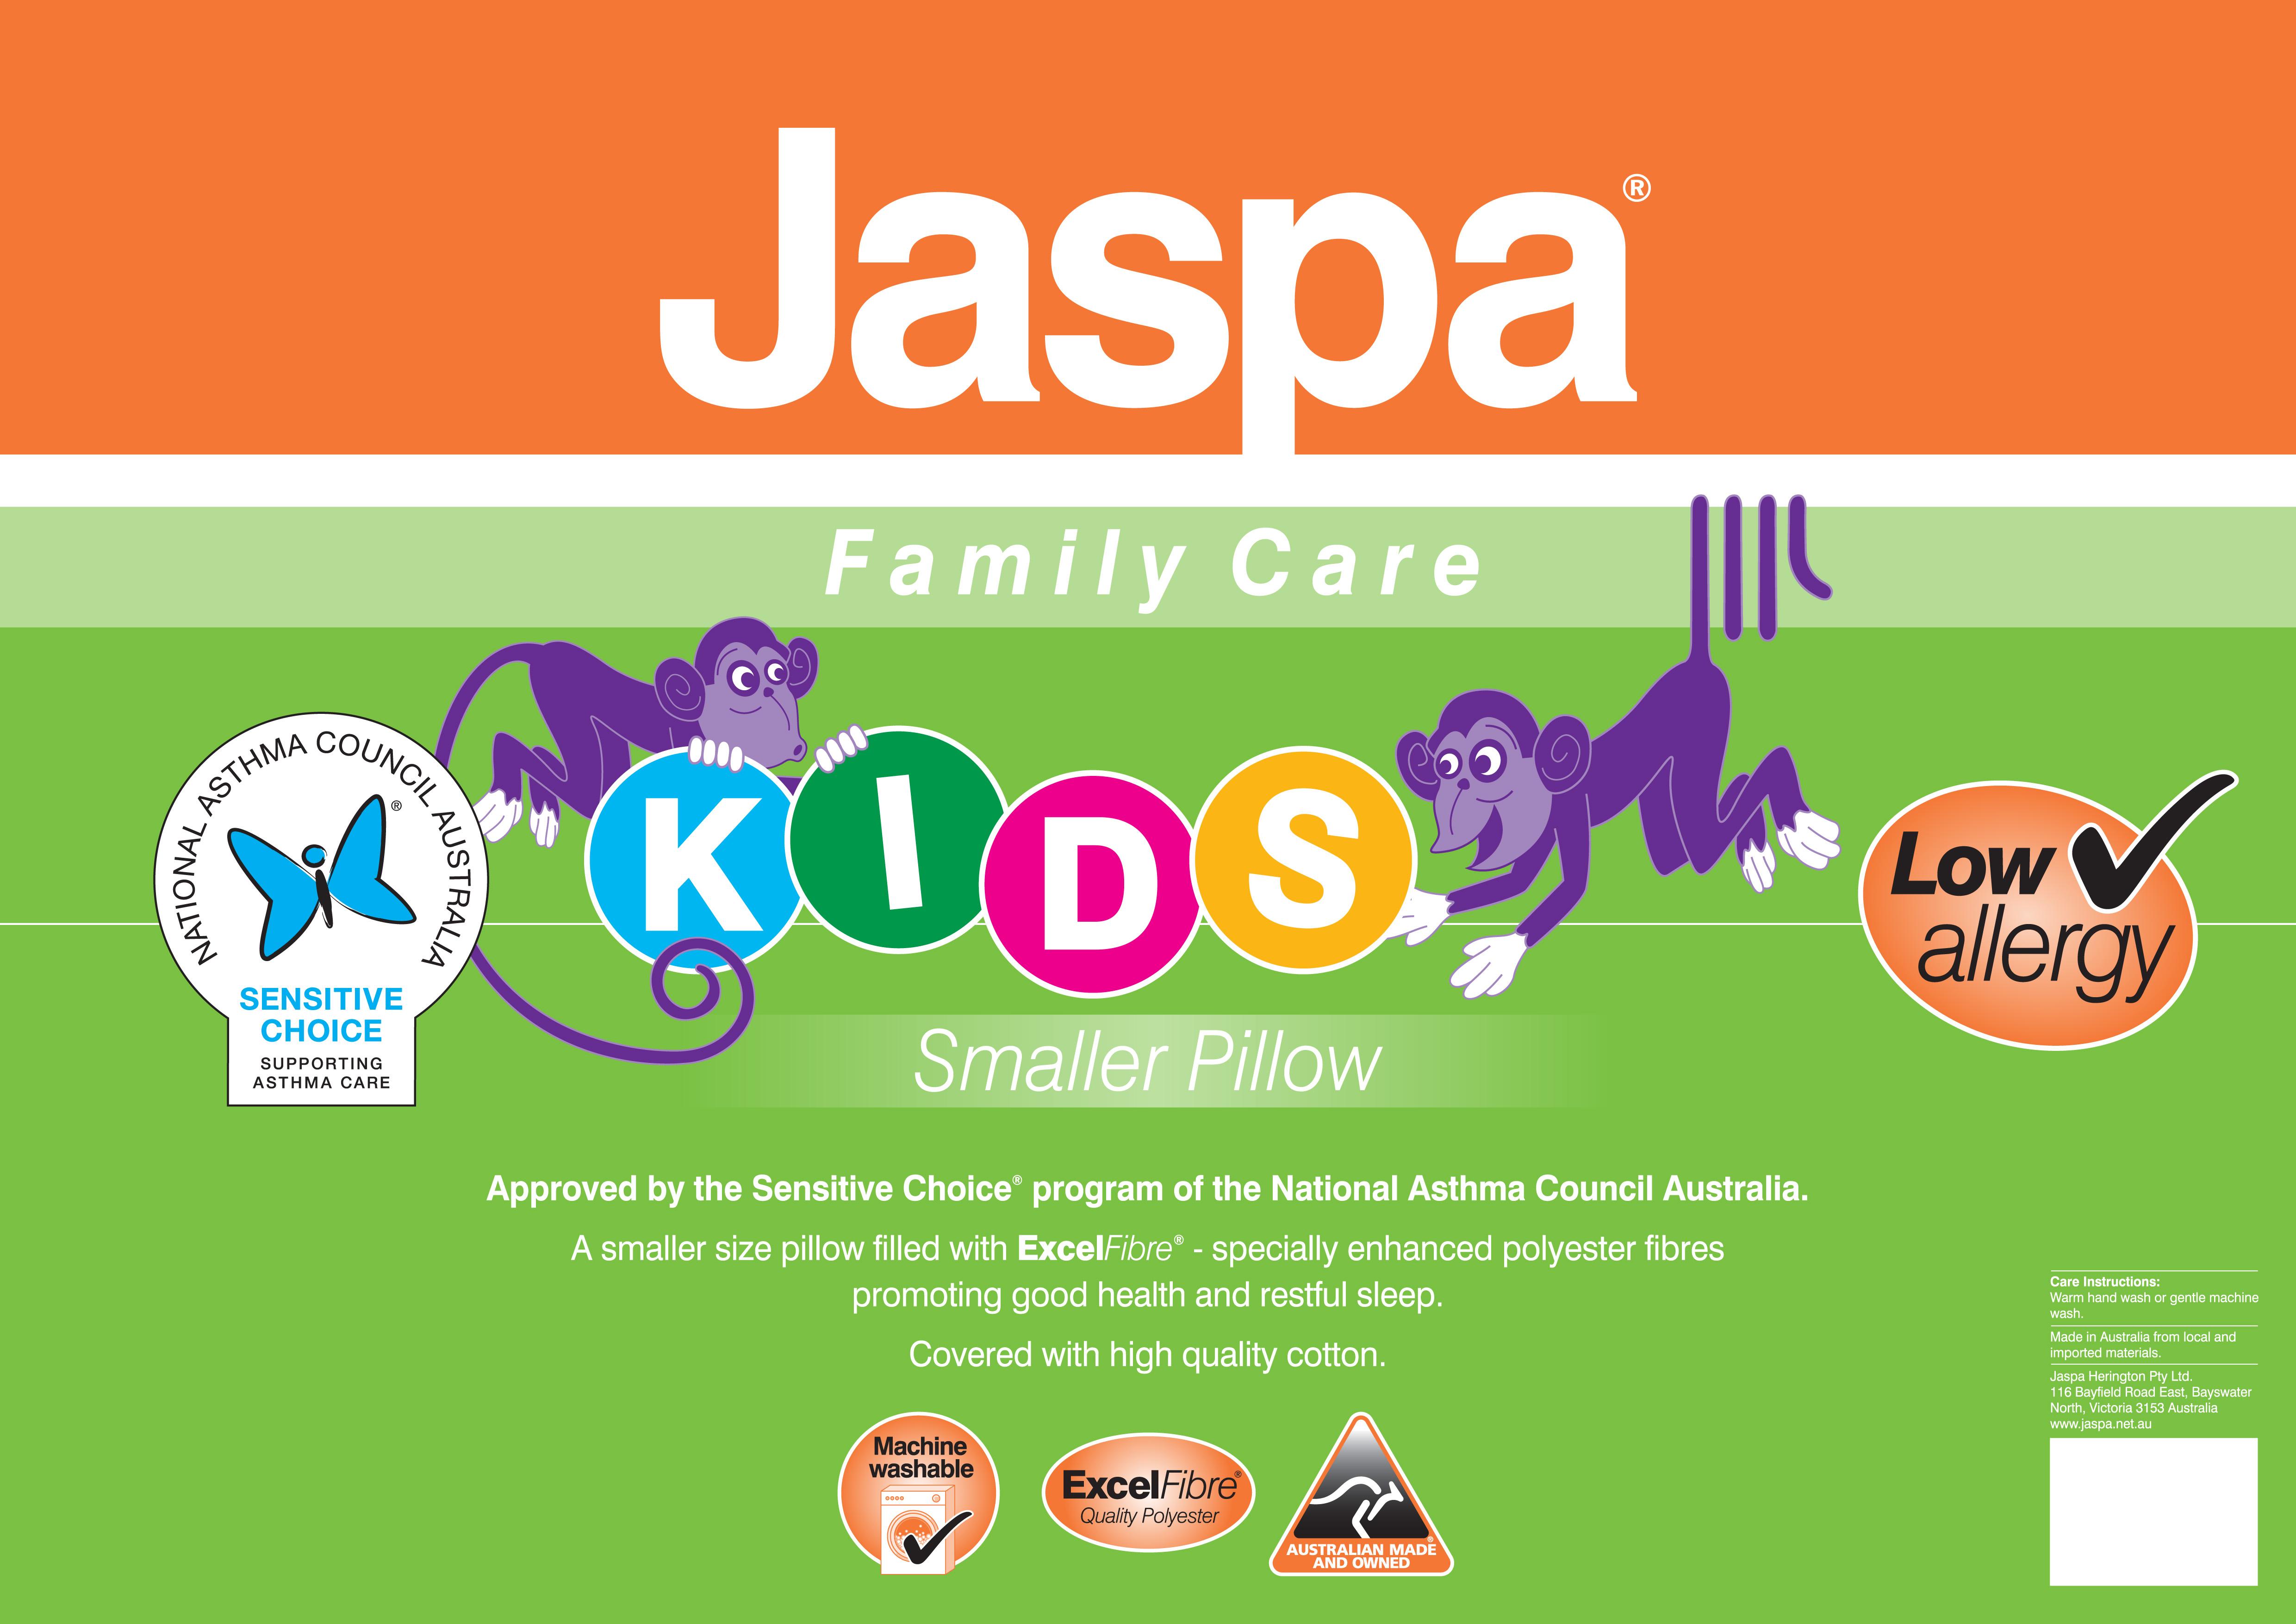 Jaspa Family Care Asthma Friendly Kids Pillow